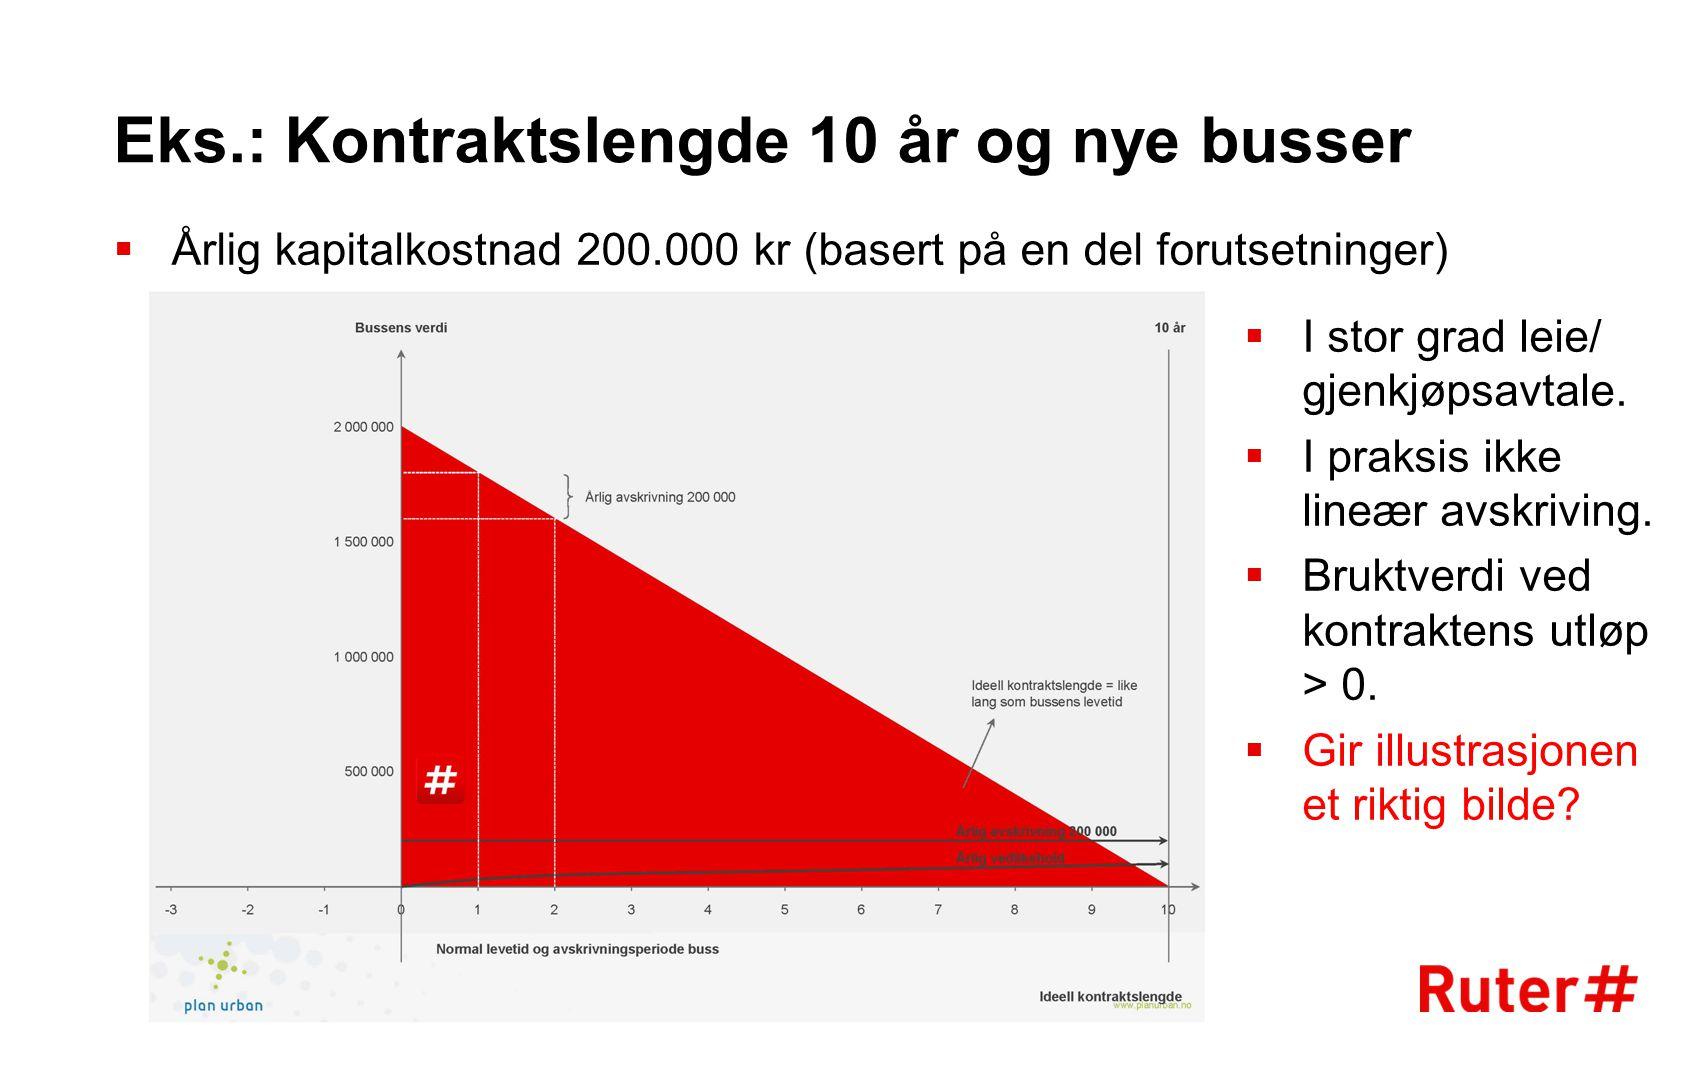 Eks.: Kontraktslengde 10 år og nye busser